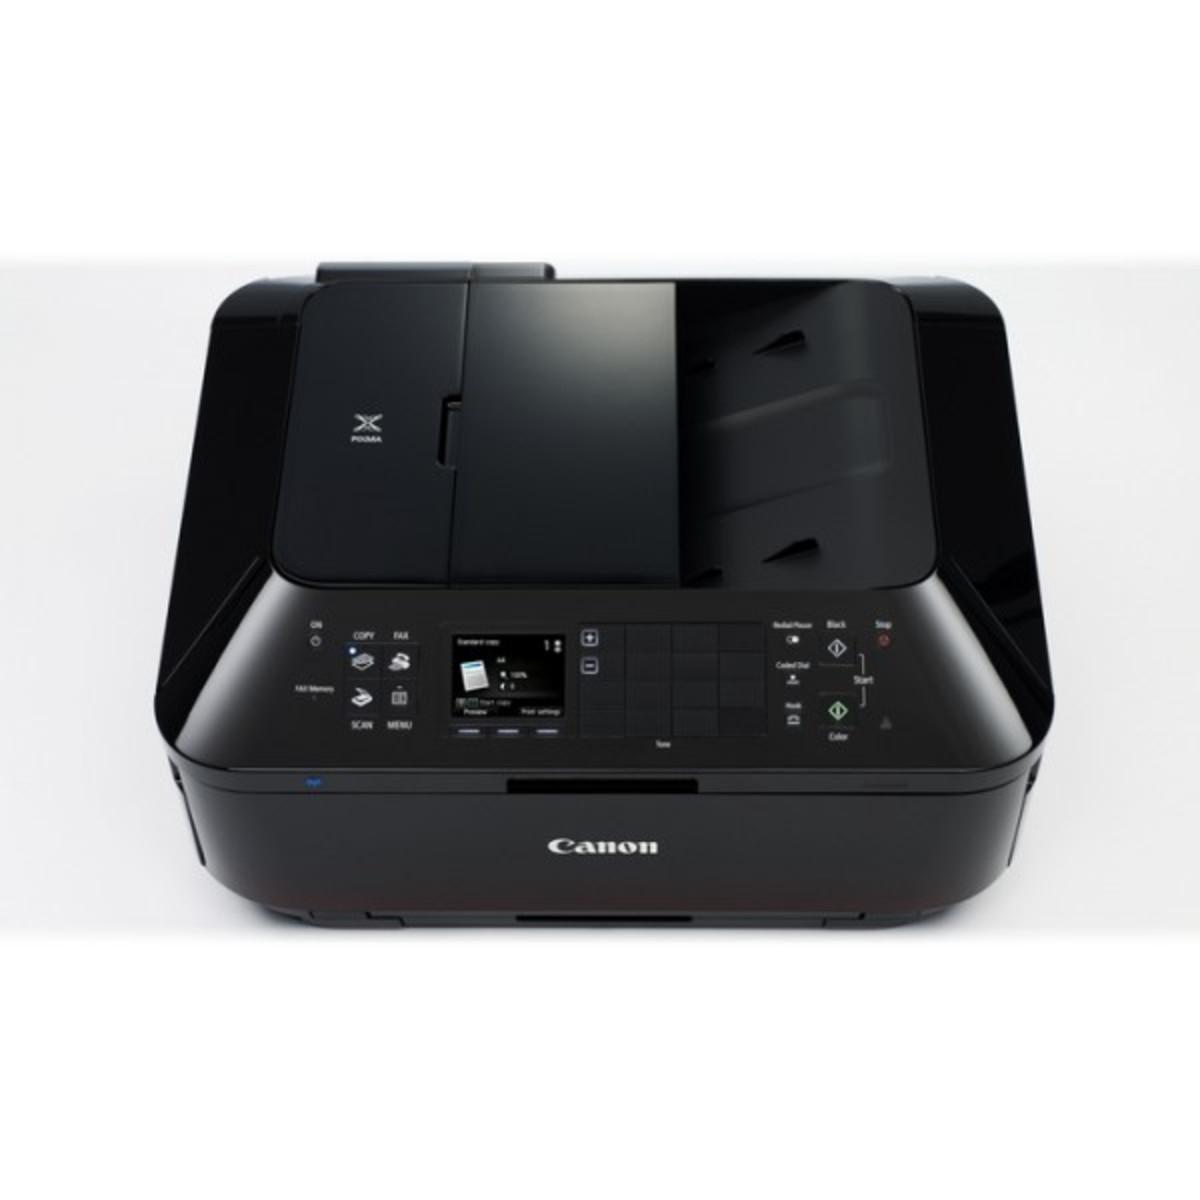 Canon MX926 Office Inkjet Printer